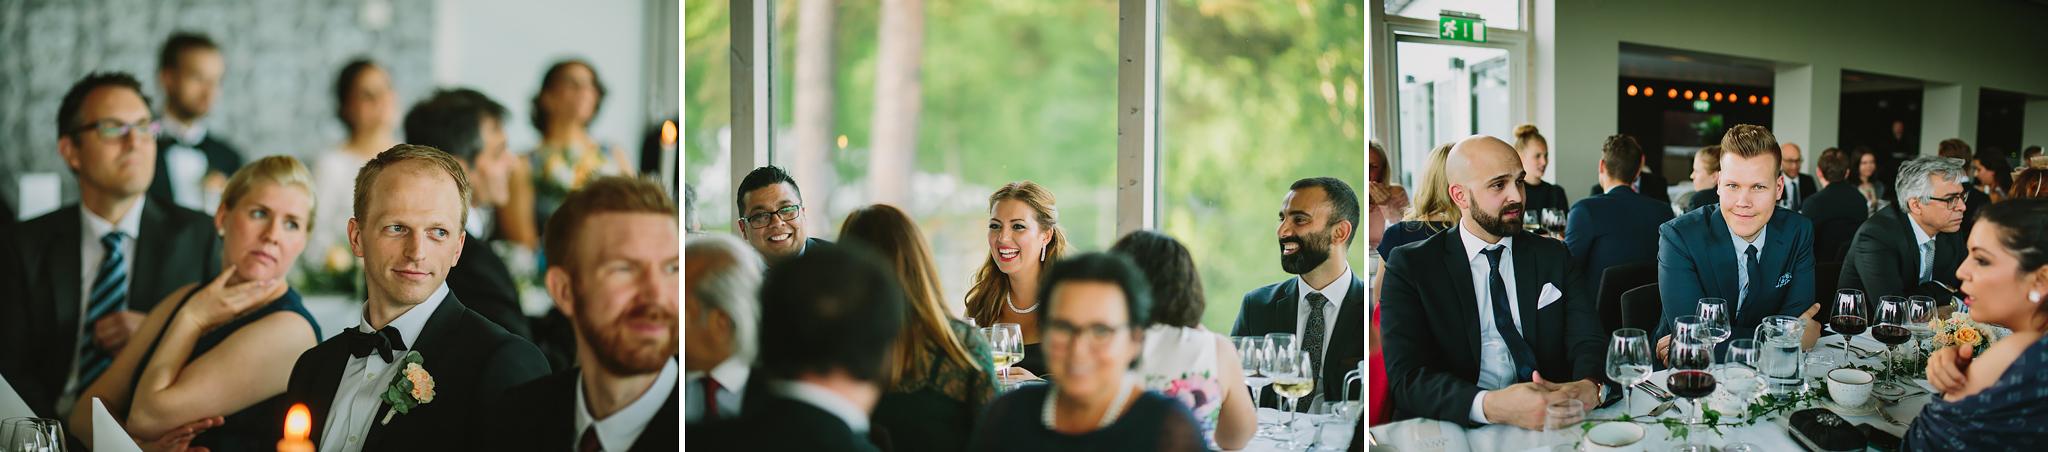 Tal under bröllopsmiddag